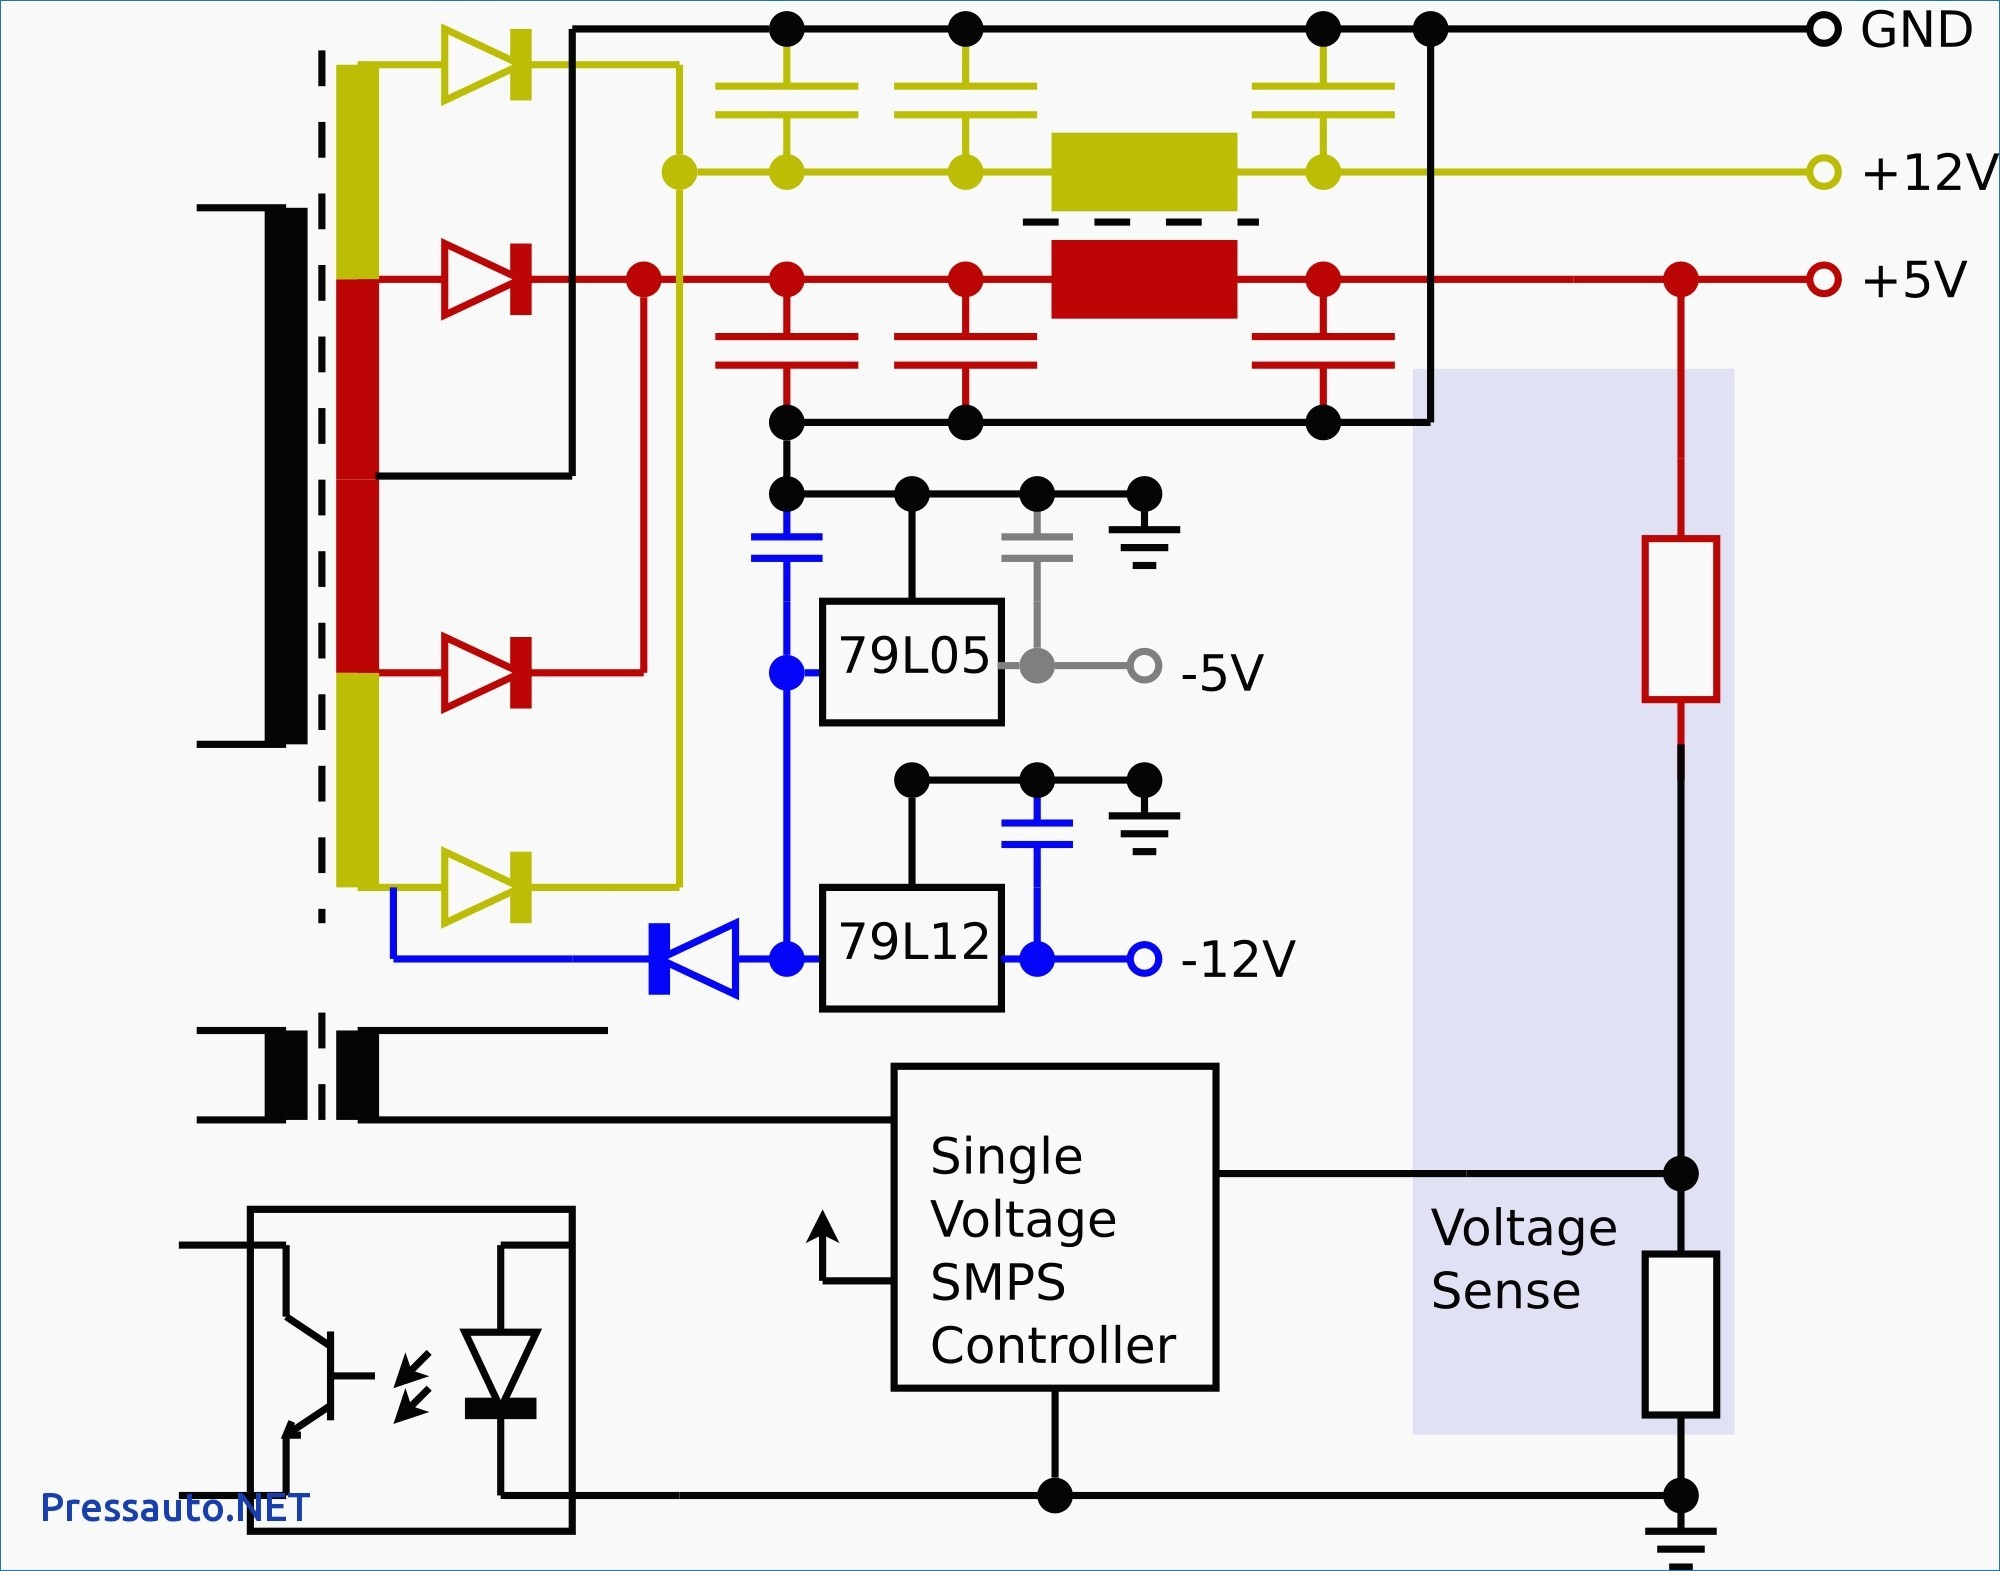 hight resolution of 24v transformer wiring diagram dayton contactors phase 5th power converter for 12v